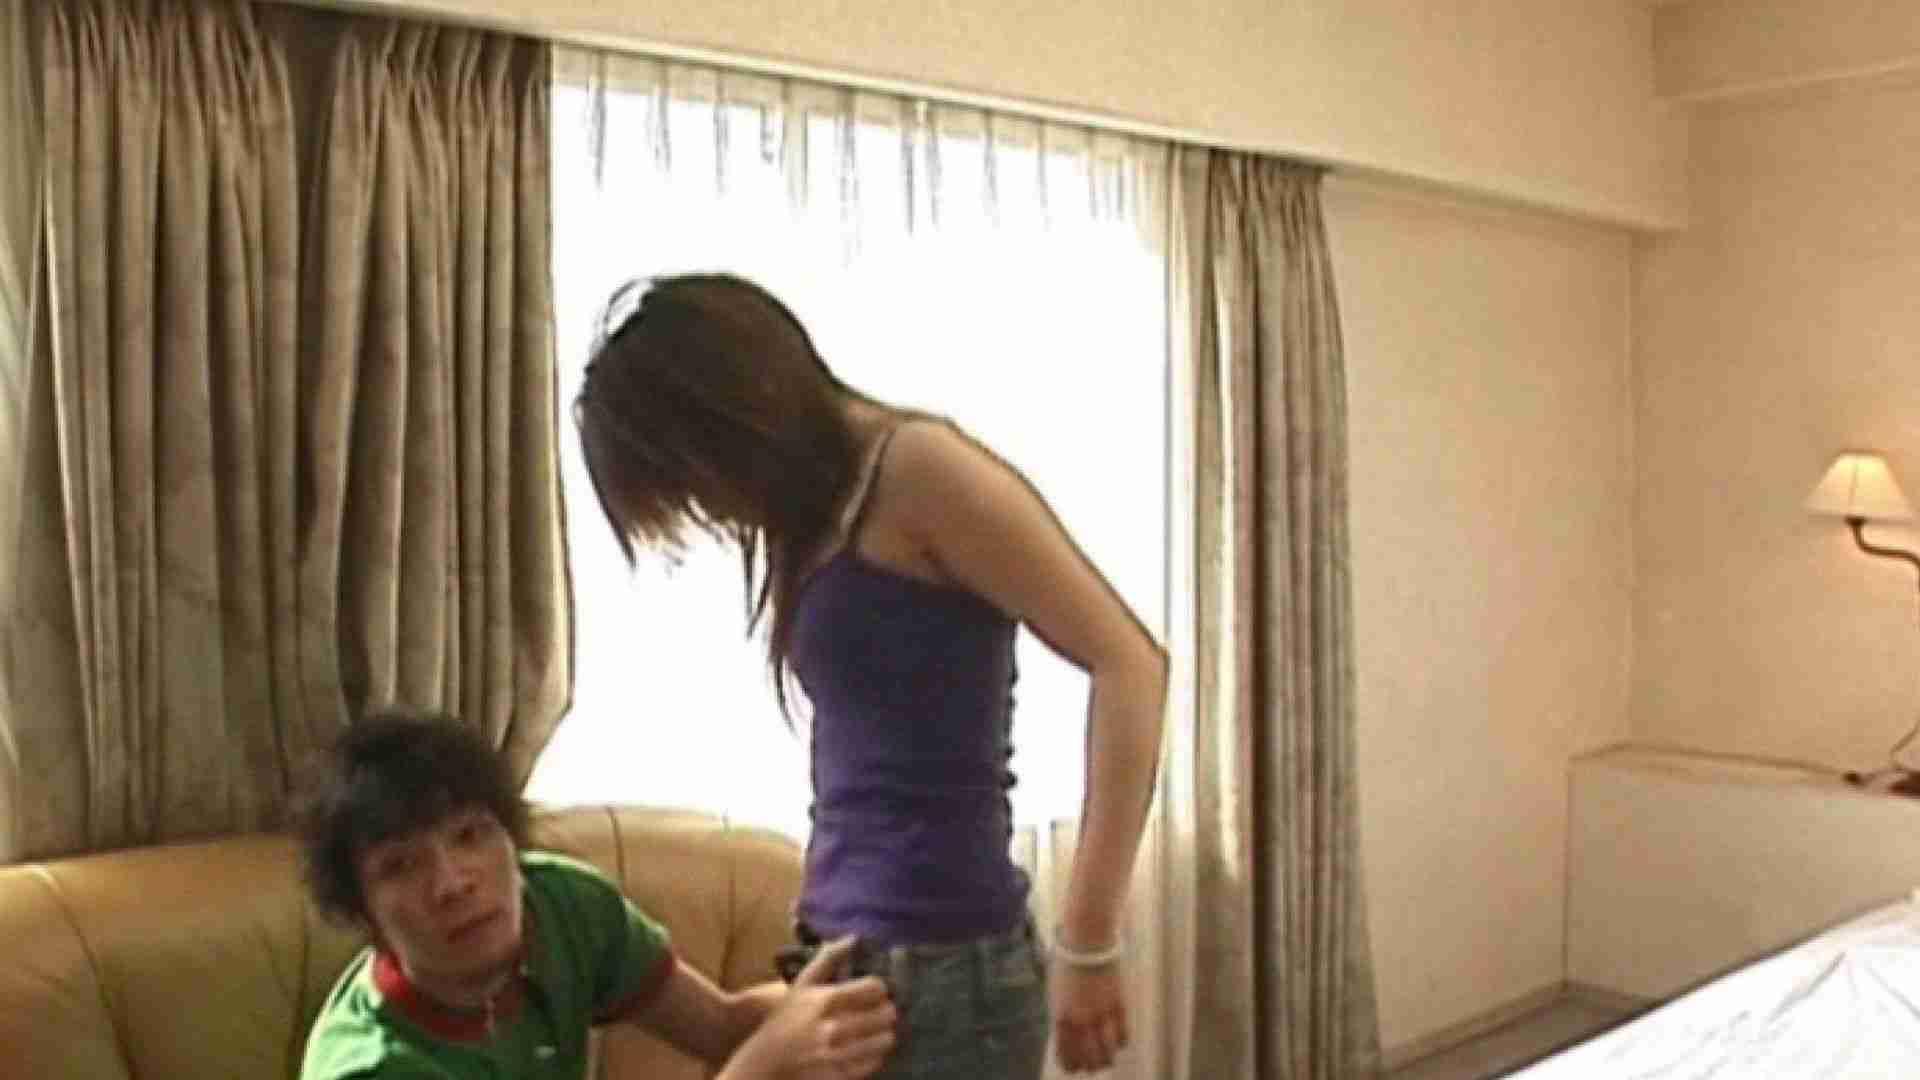 S級厳選美女ビッチガールVol.53 美女丸裸  100pic 42